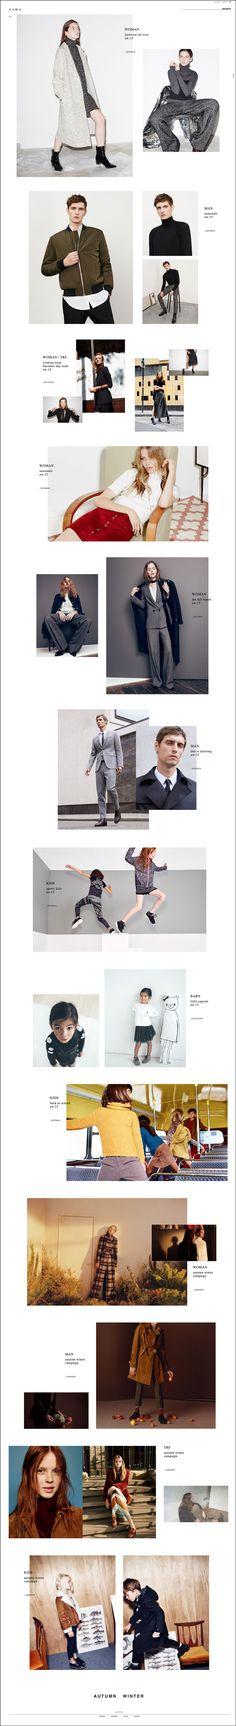 Zara - Editorial Page. Digital / Web Design. 12.10.15